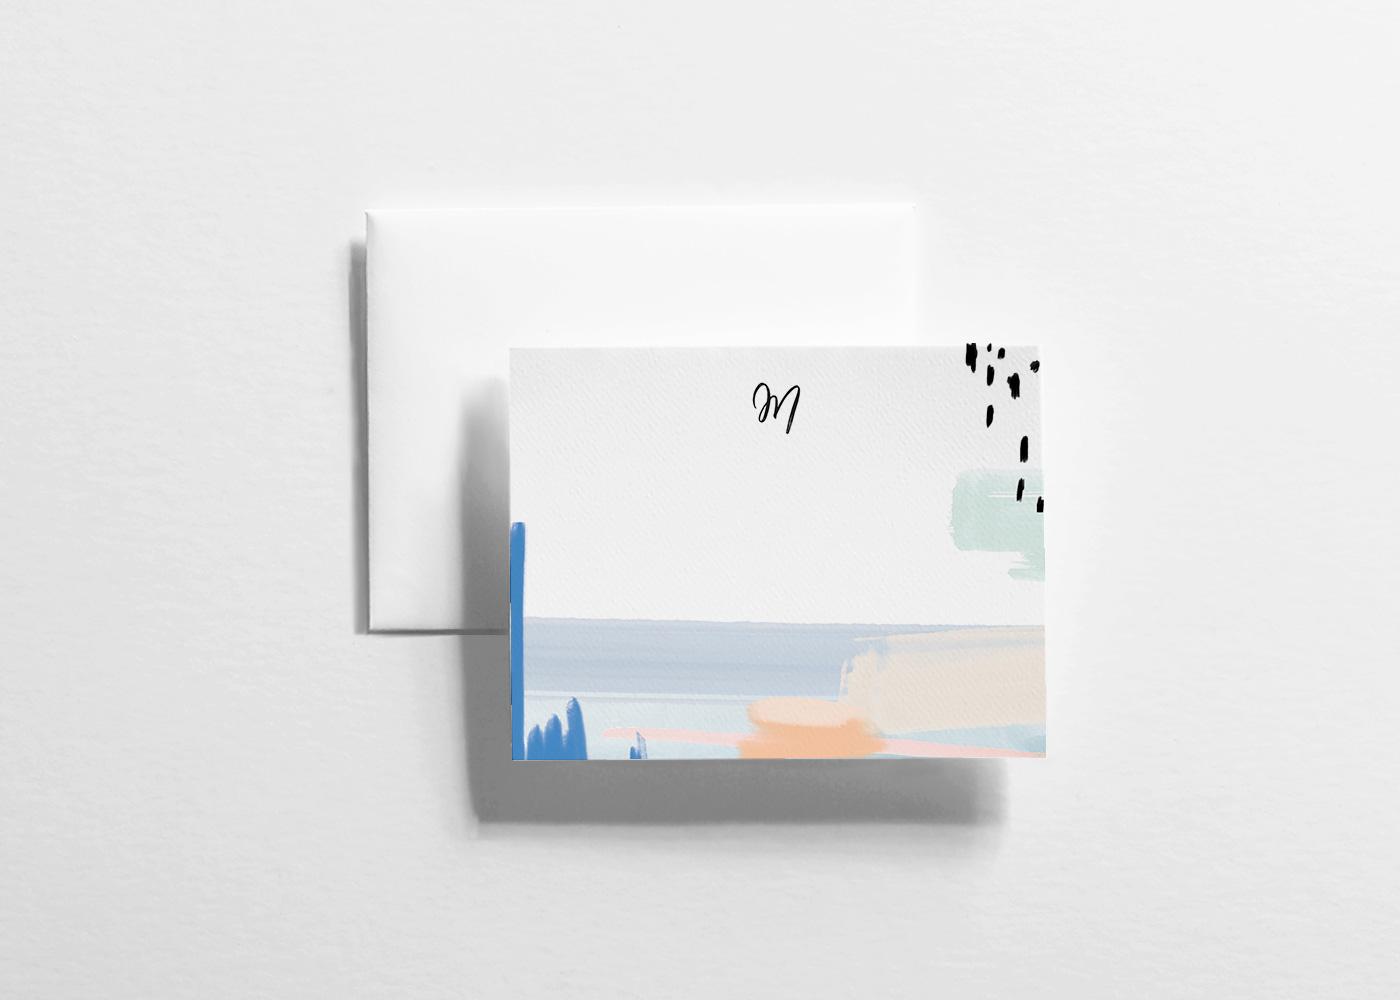 LoveLore_A2-Card_SP18_ModernMusings.jpg